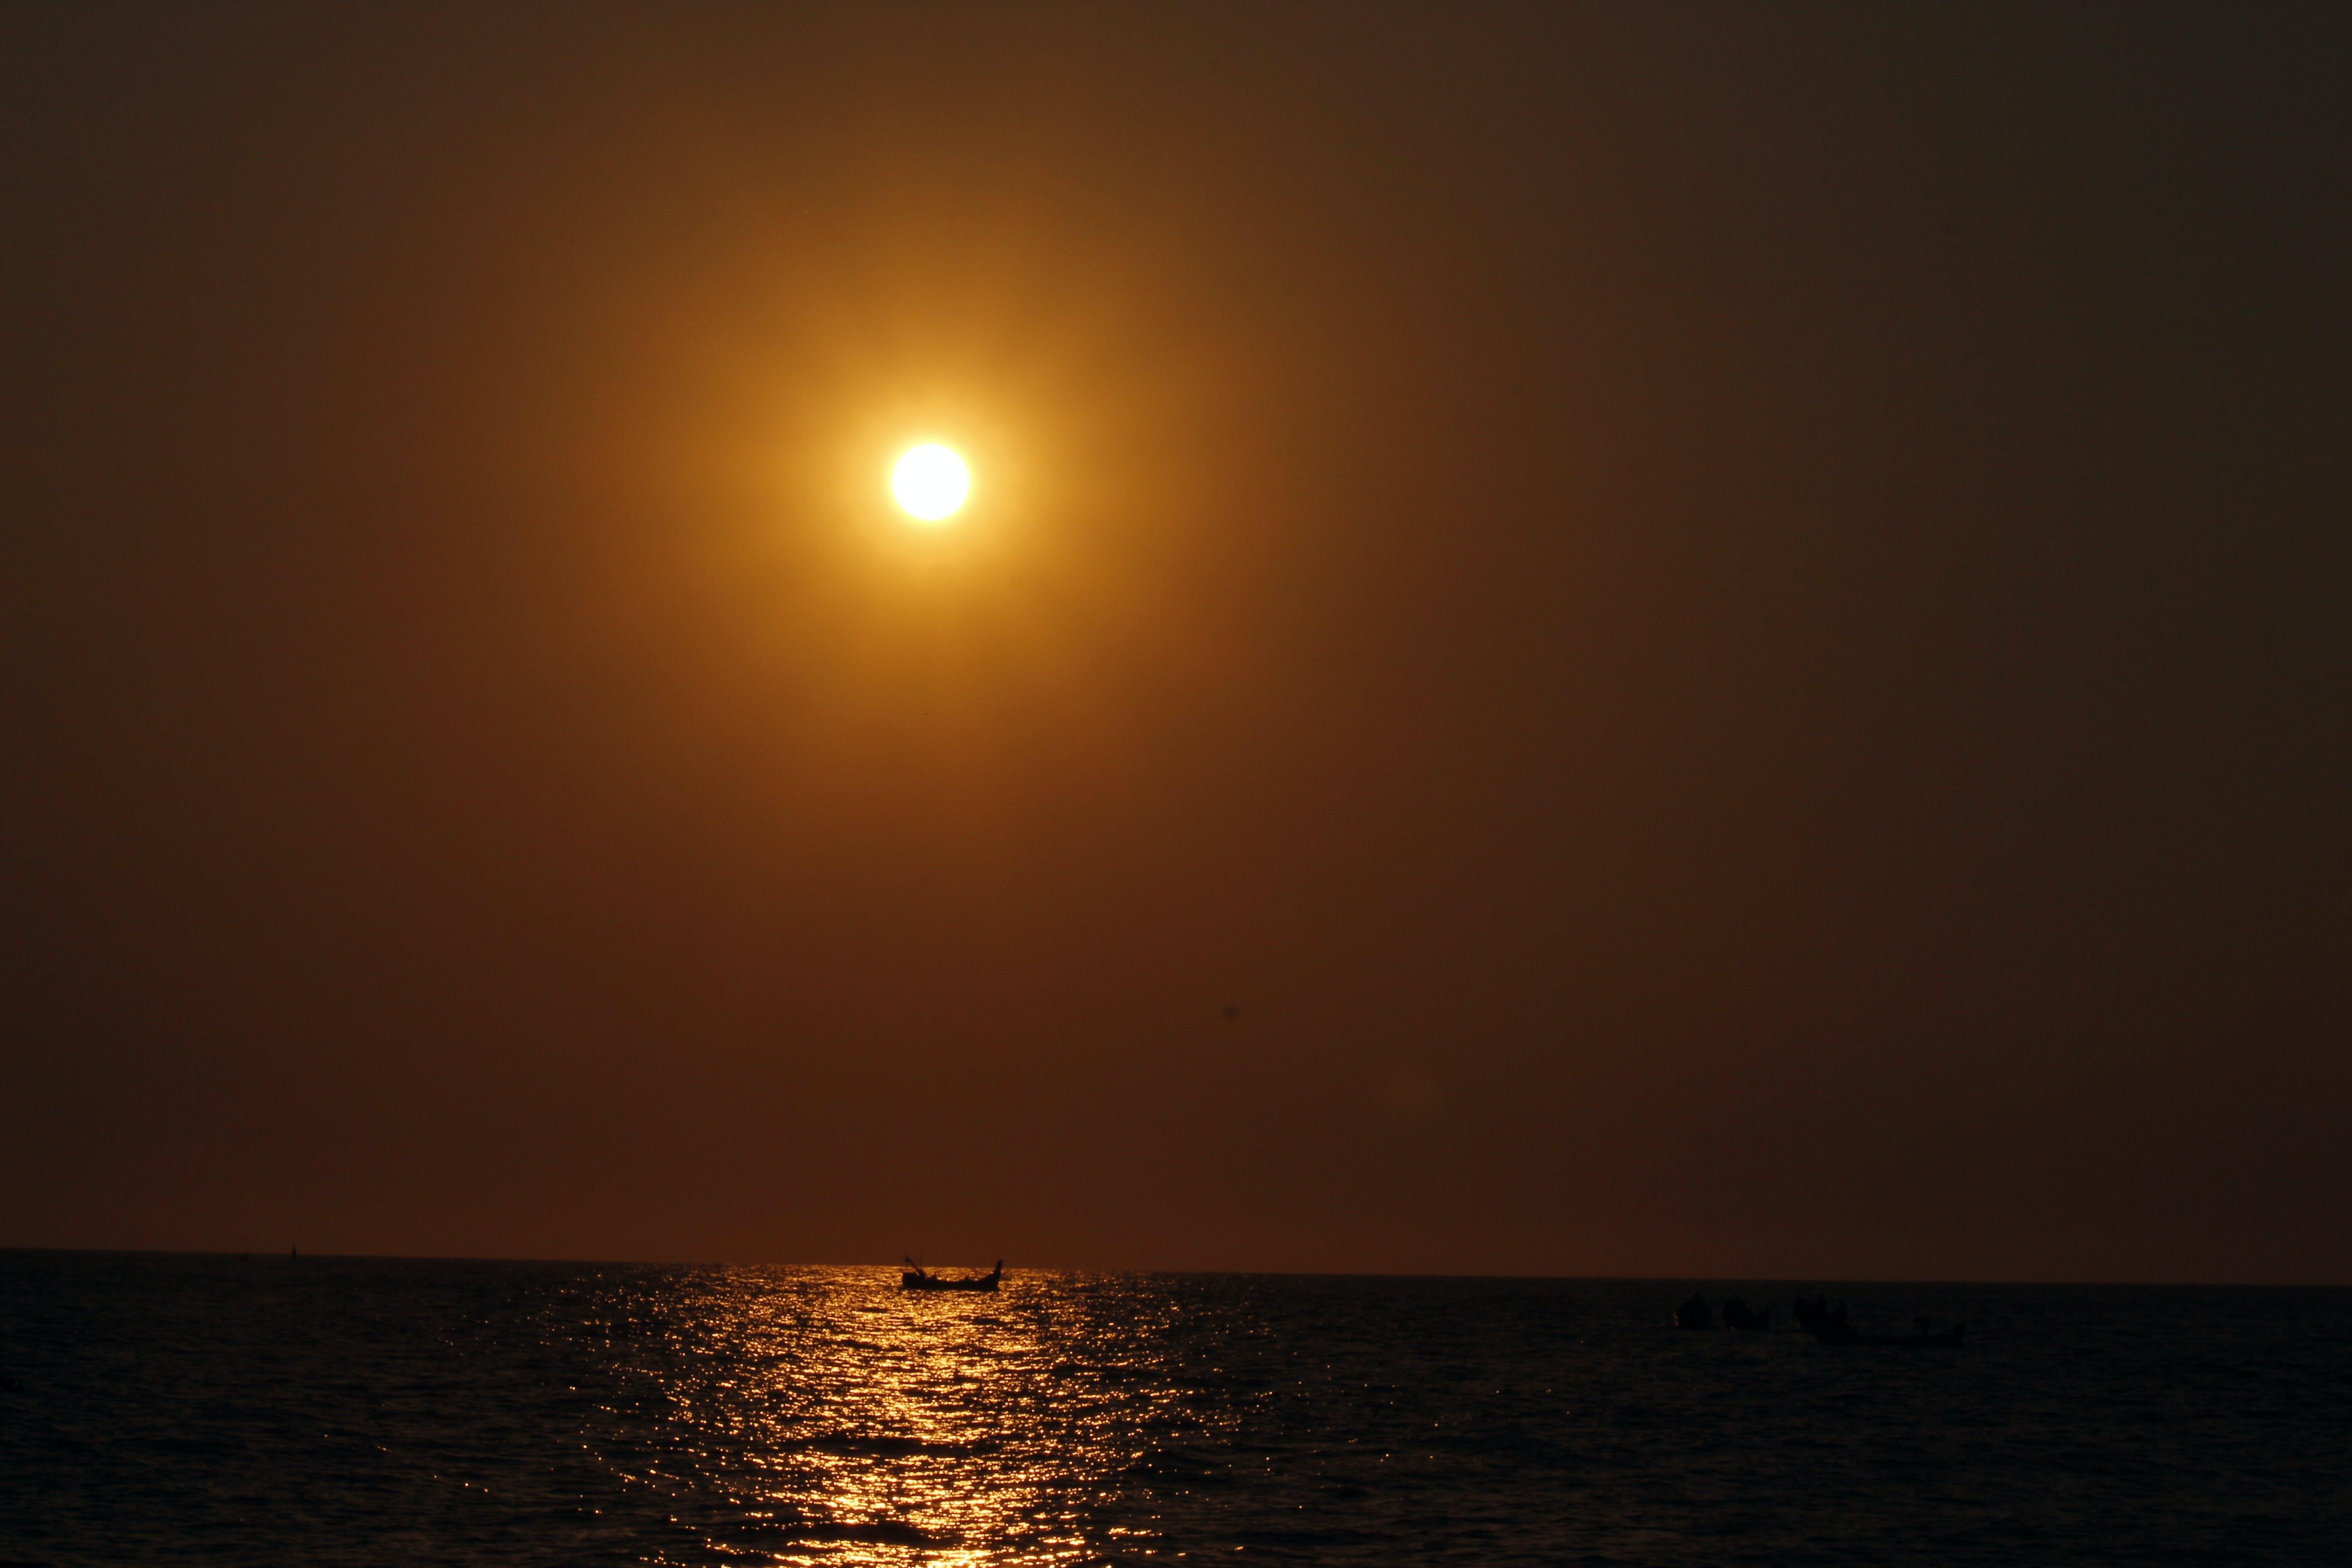 Free stock photo of beach, beach sunset, boat, evening